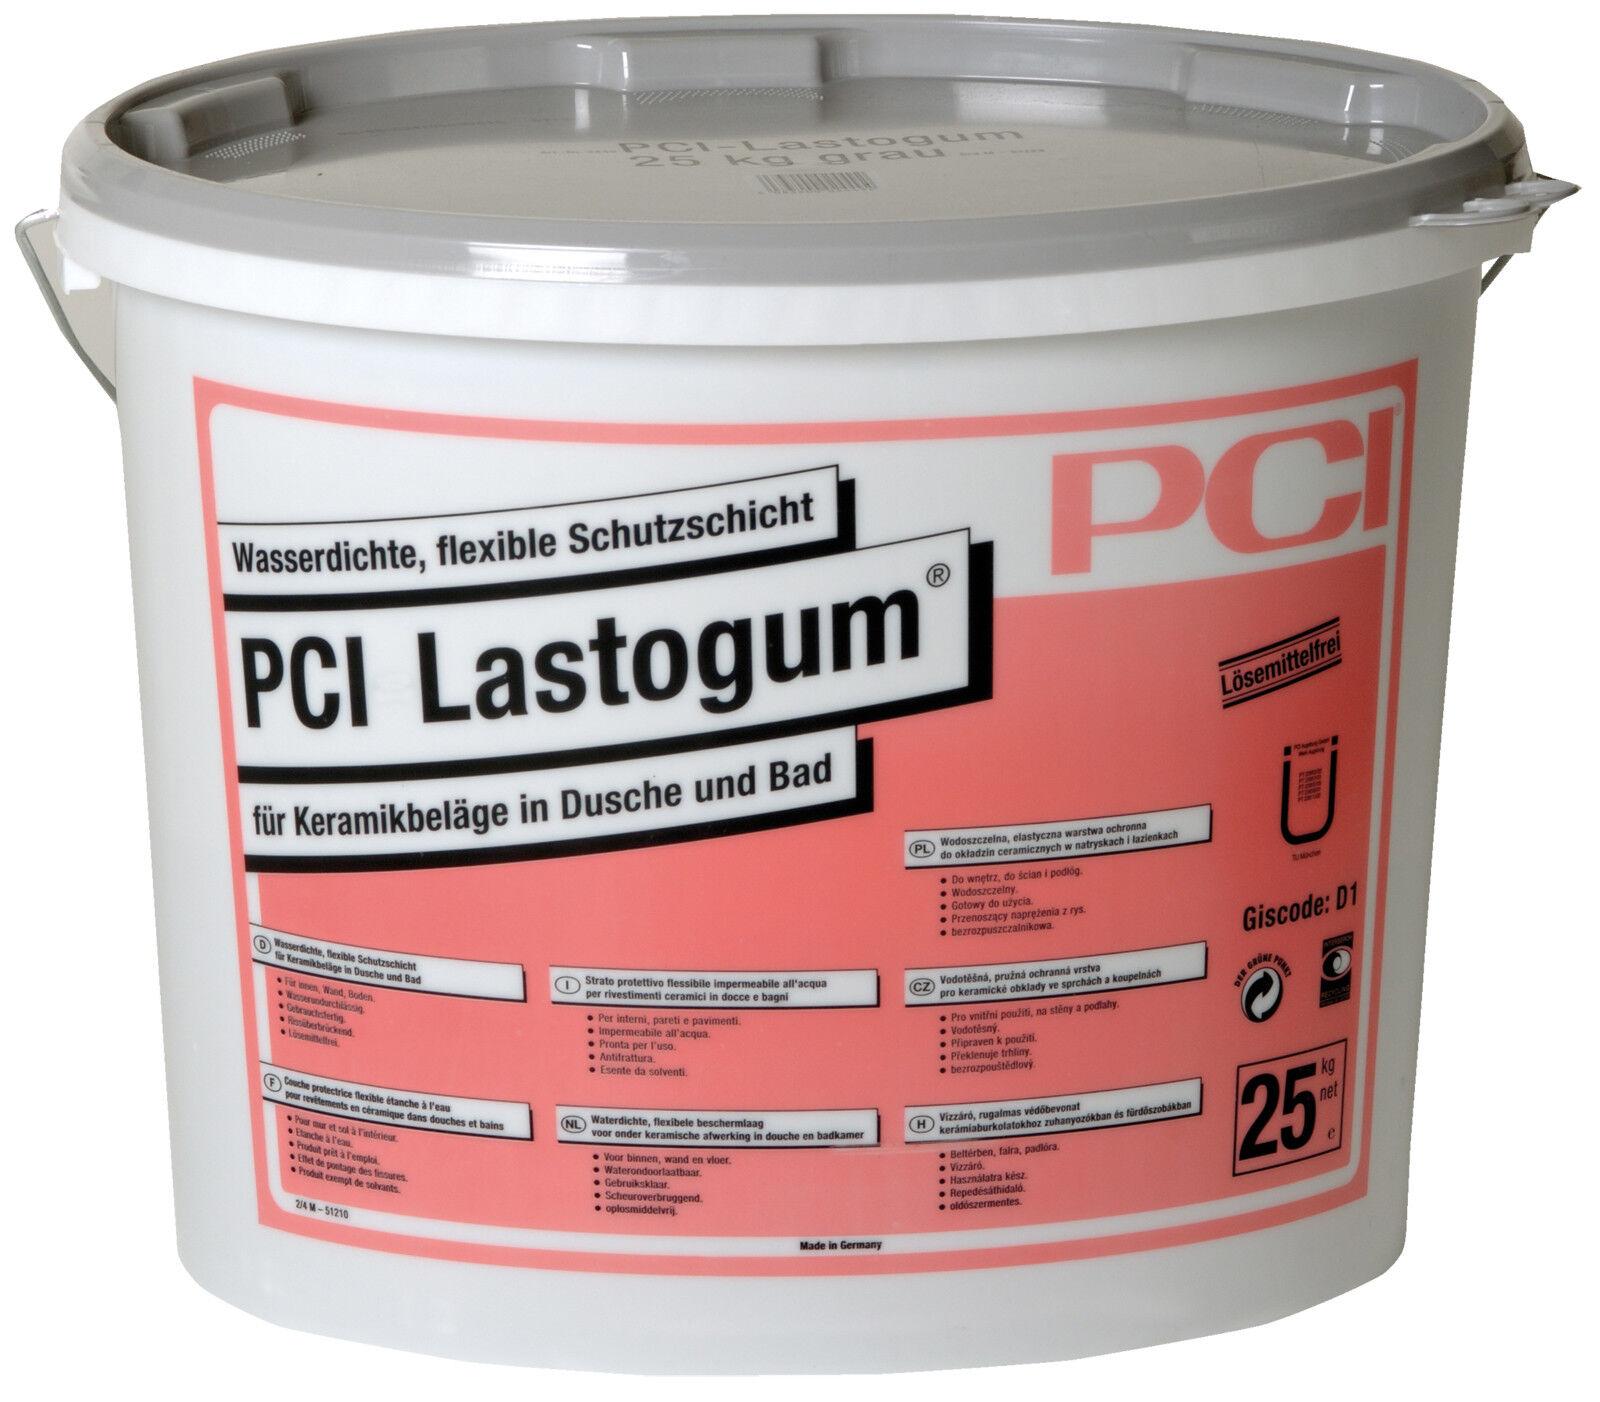 PCI Lastogum 25 kg grau Flüssigfolie Duschabdichtung Badabdichtung Abdichtung